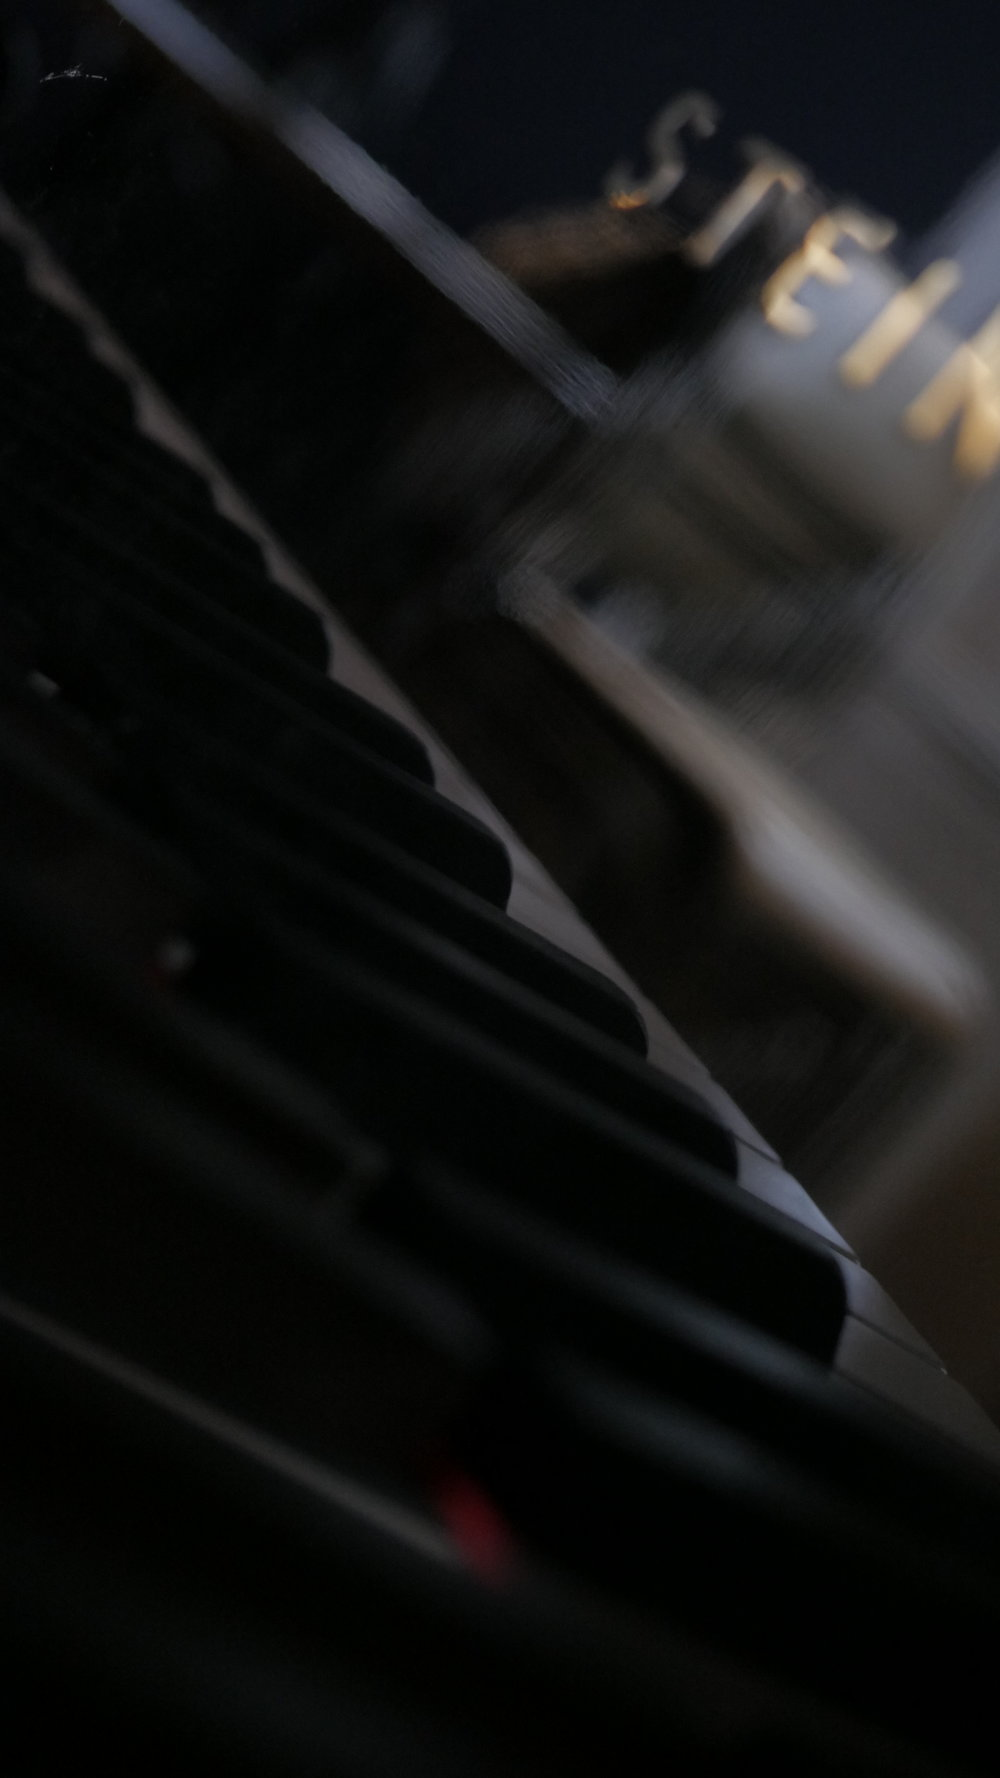 LFPiano_smartphone cover dark.JPG